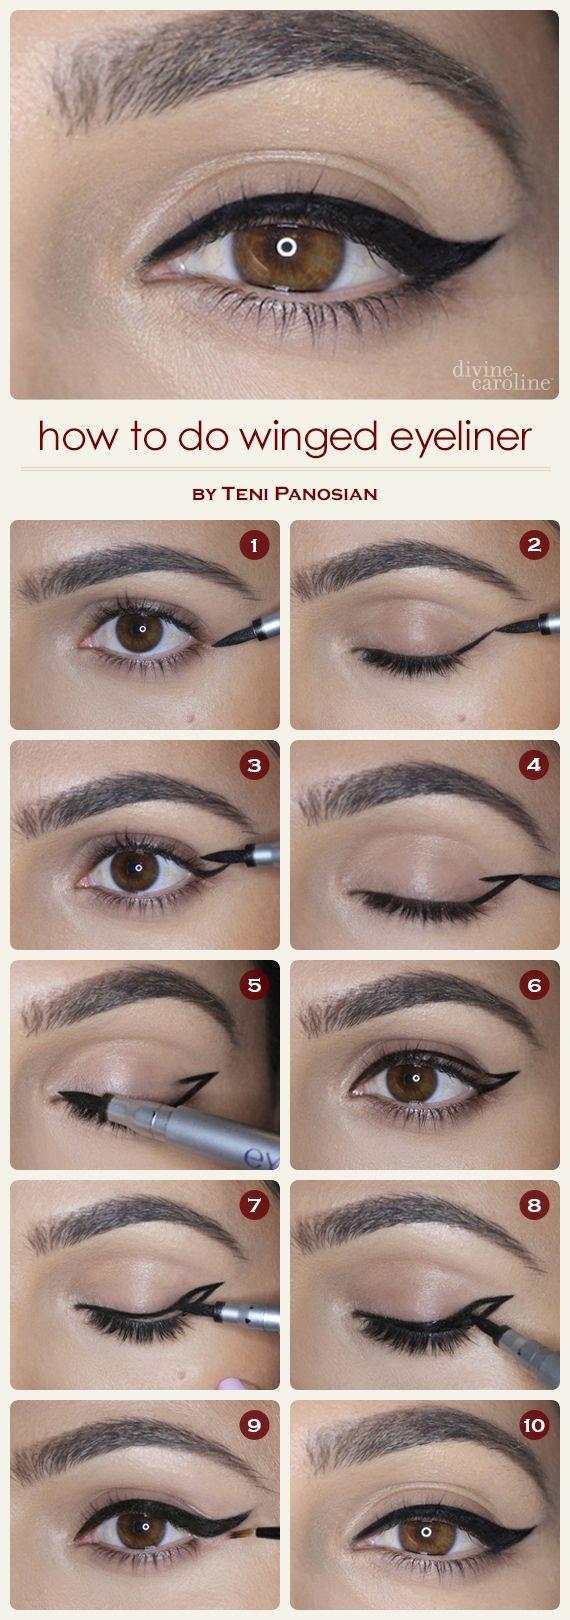 Simple steps for oooh la la eyes :)